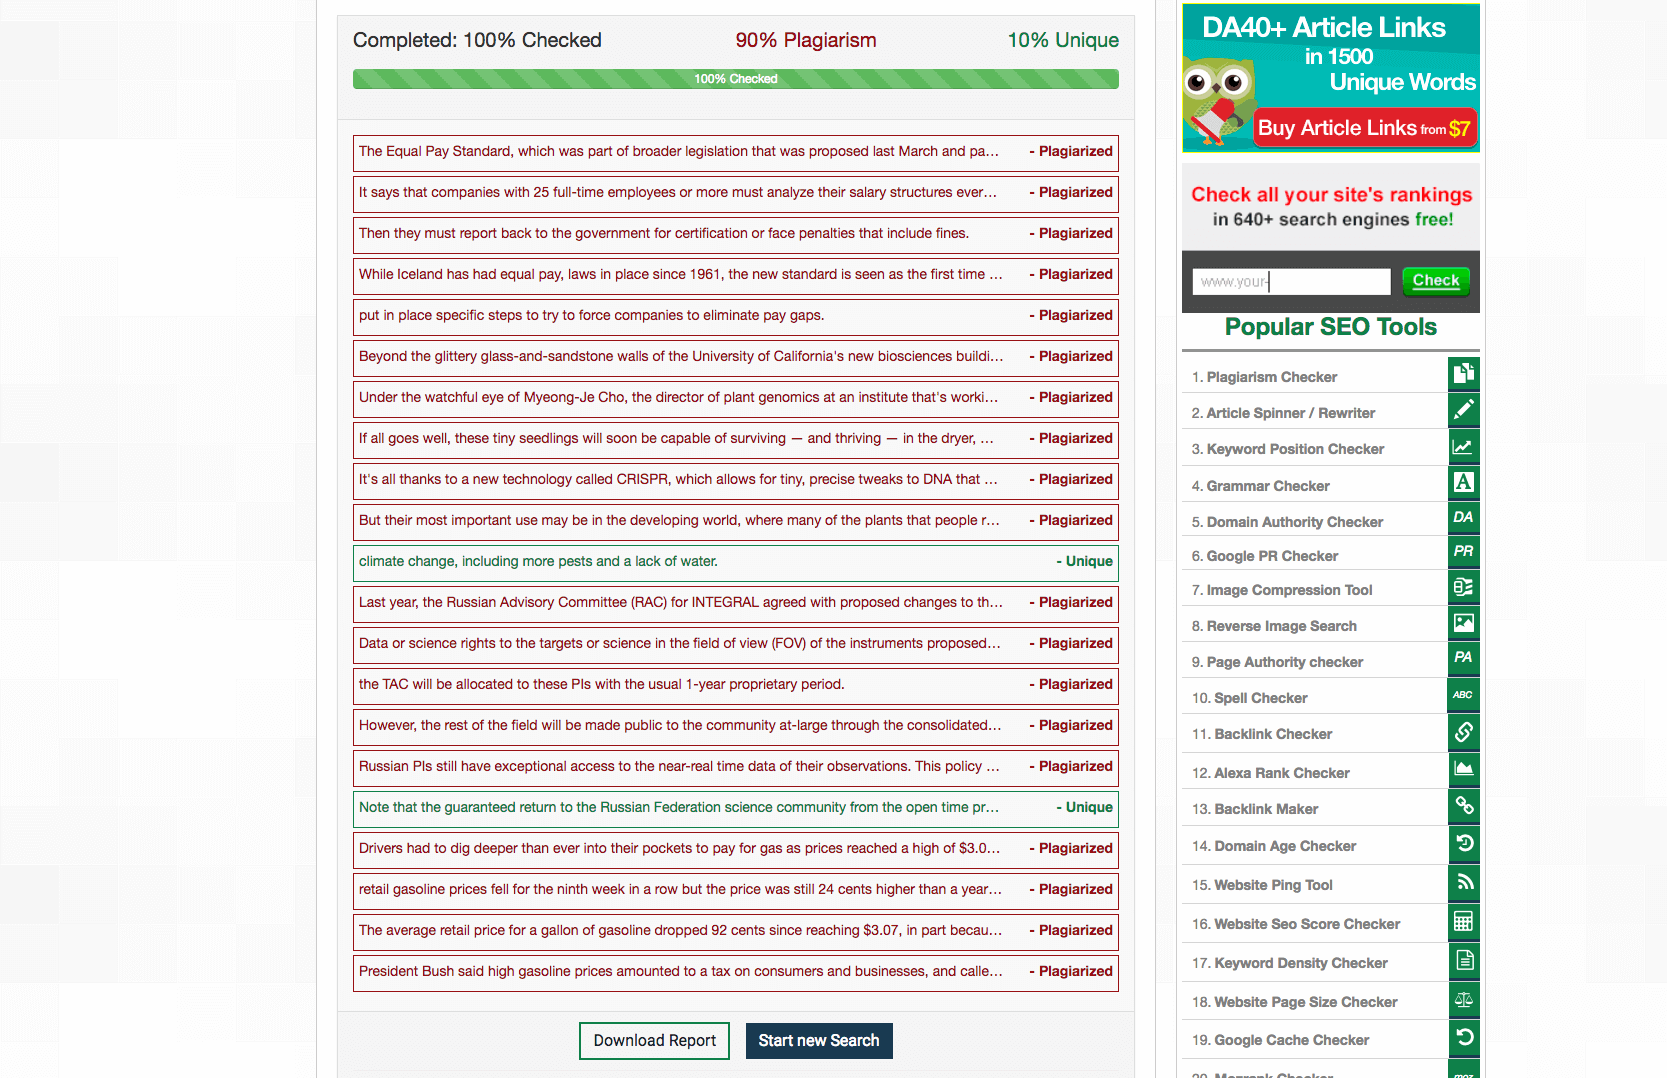 Smallseotools Plagiarism Checker report